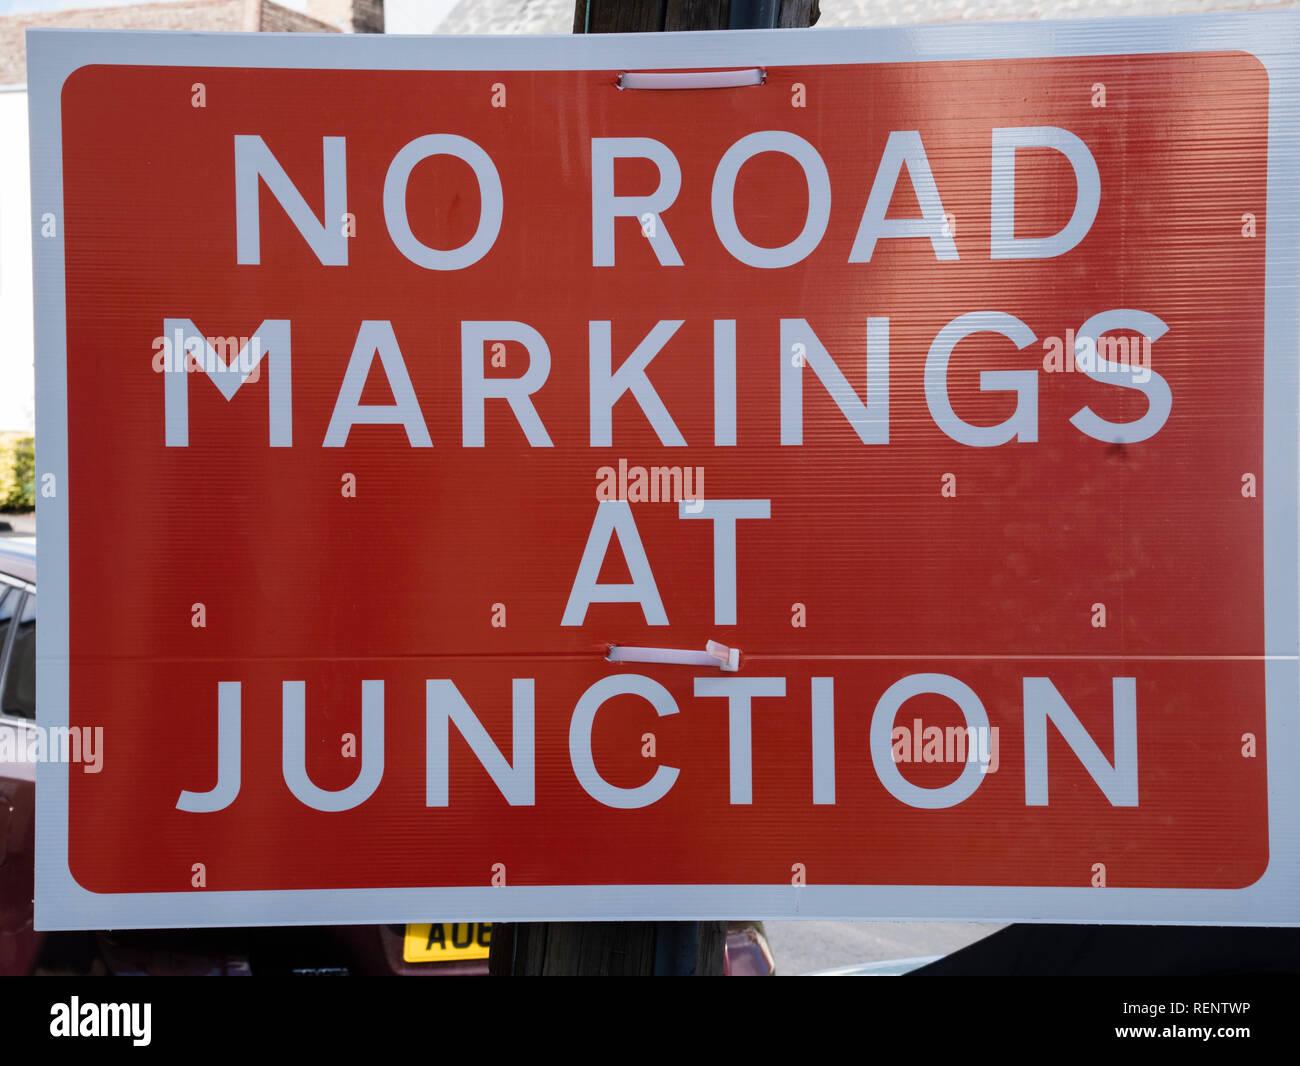 no road markings at junction - Stock Image